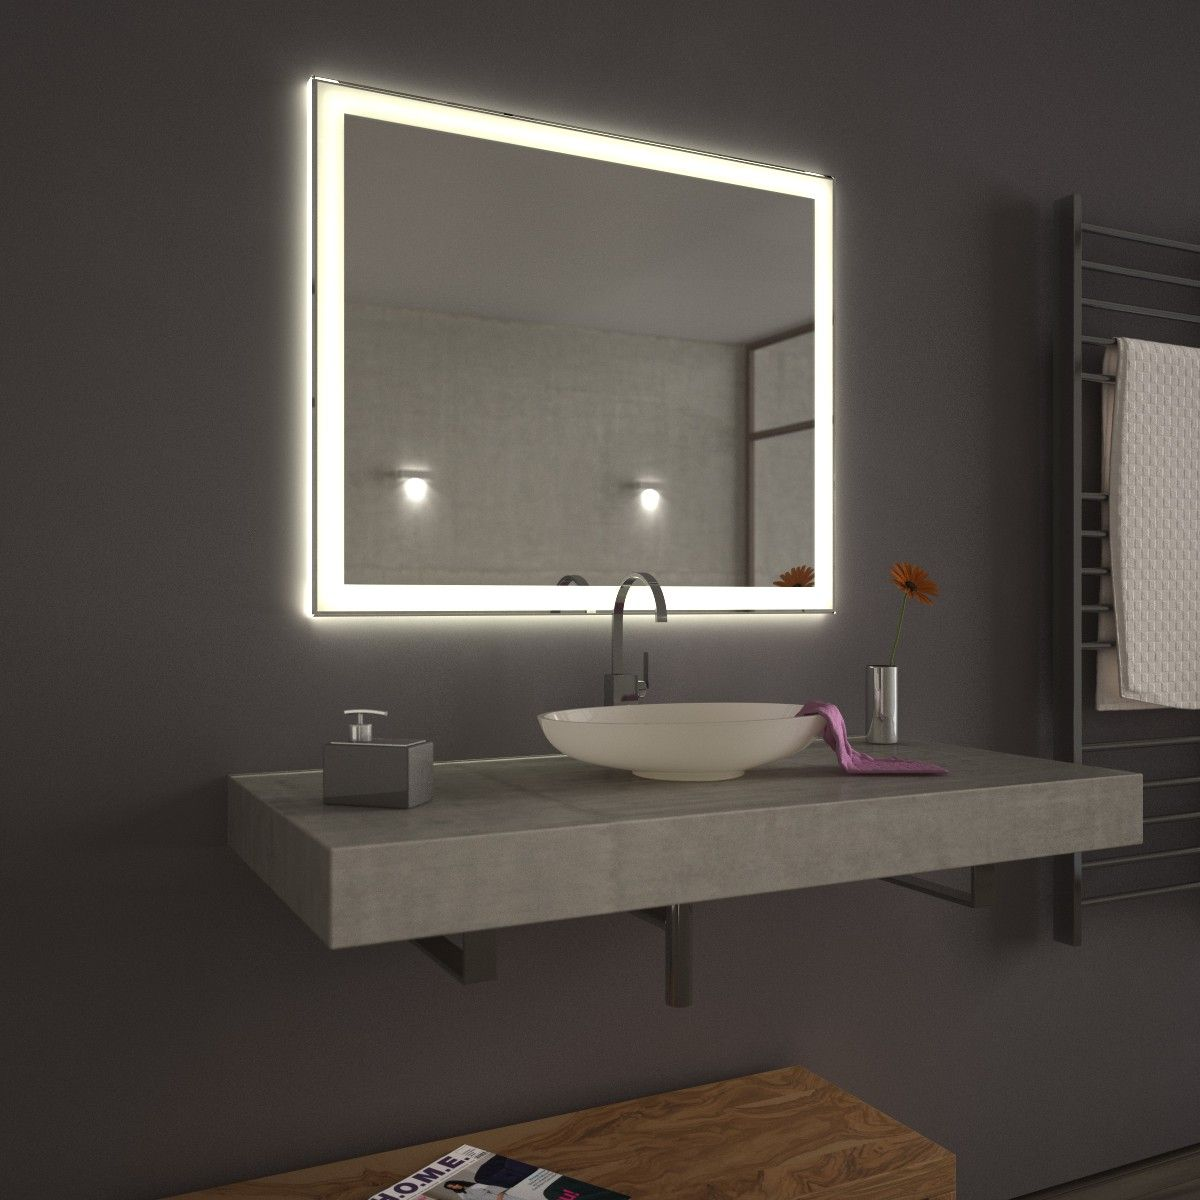 beleuchtet Velen Badspiegel beleuchtet